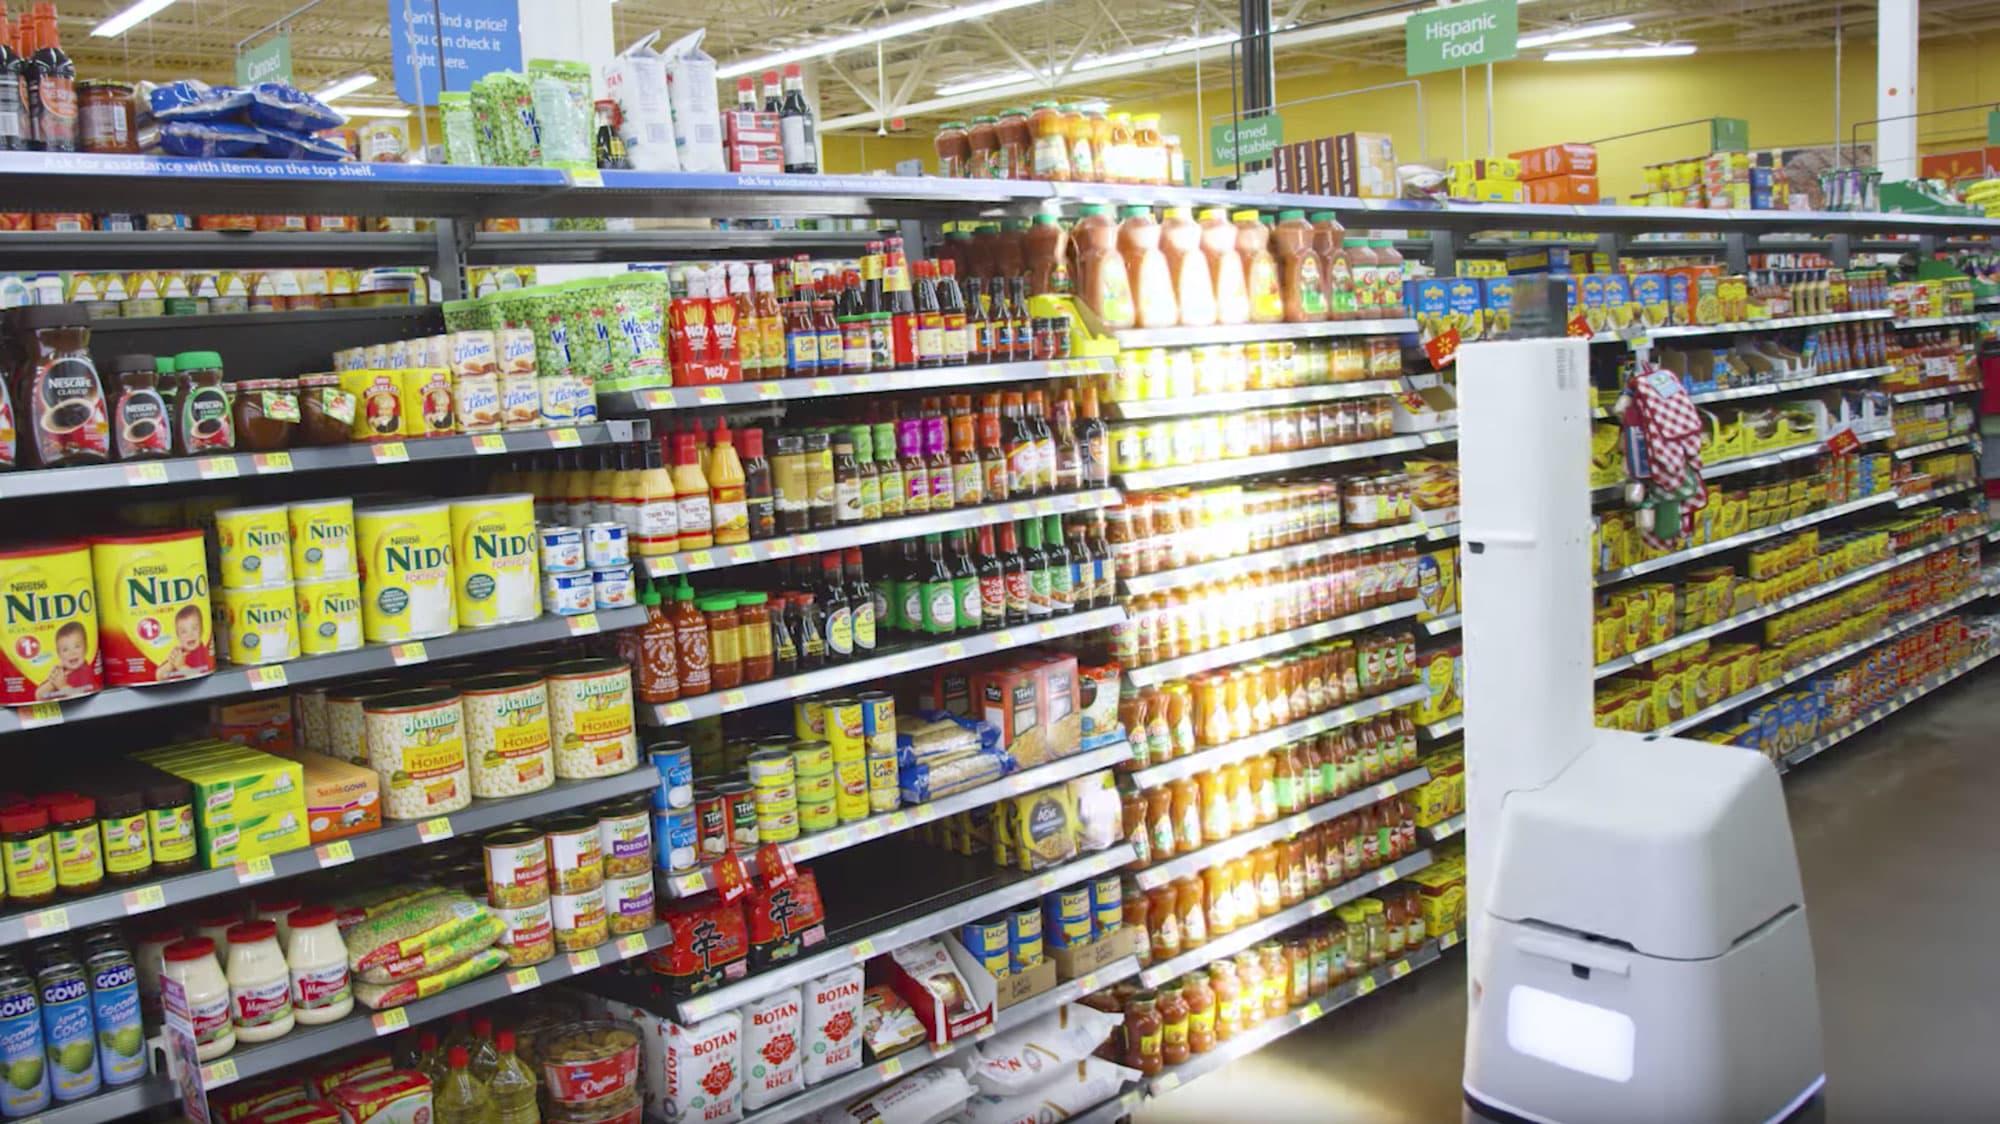 Walmart is using shelf scanning robots to audit its stores jpg 2000x1124  Walmart store shelves 0afade08f